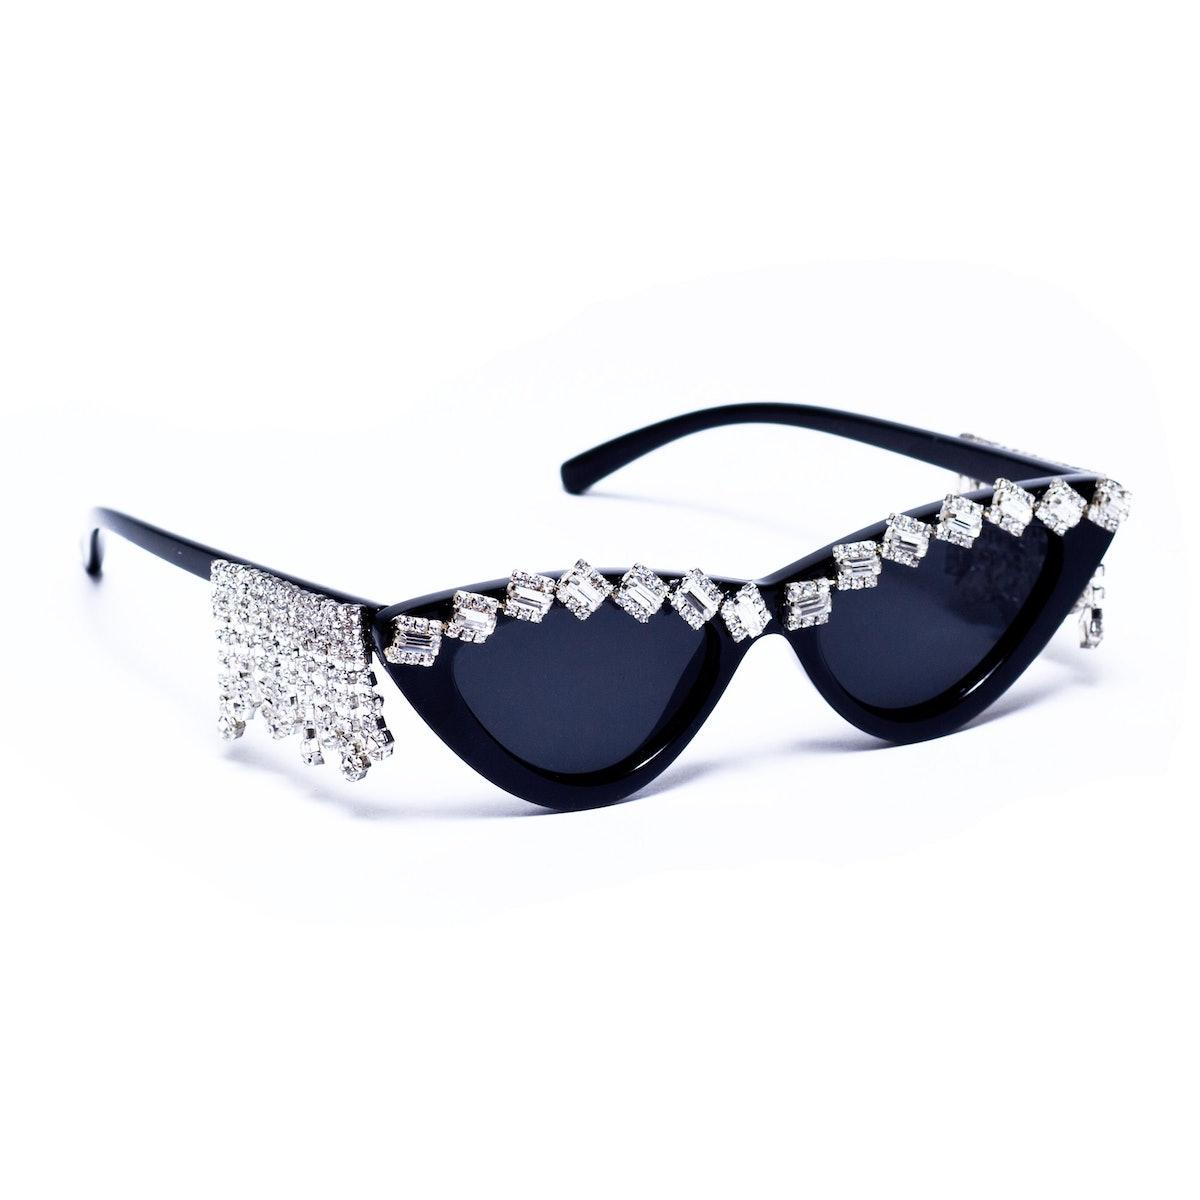 Nroda Showstopper Sunglasses